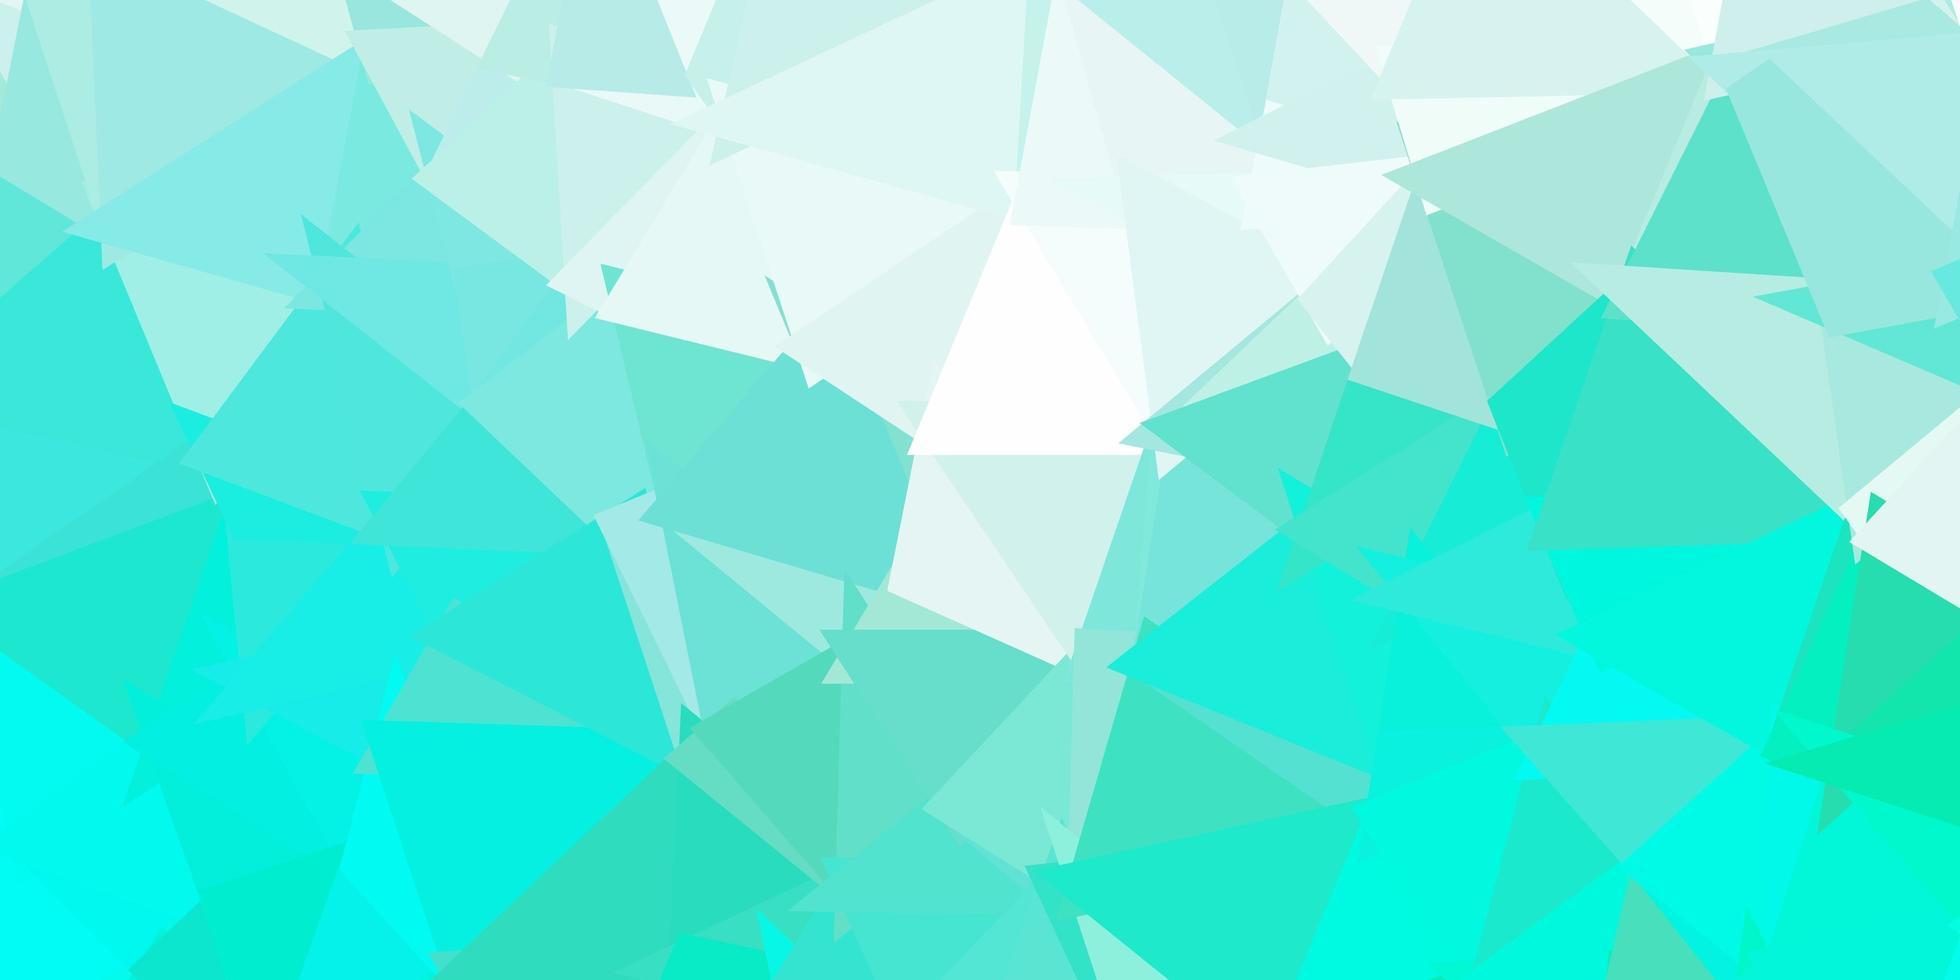 papel tapiz poligonal geométrico vector verde claro.